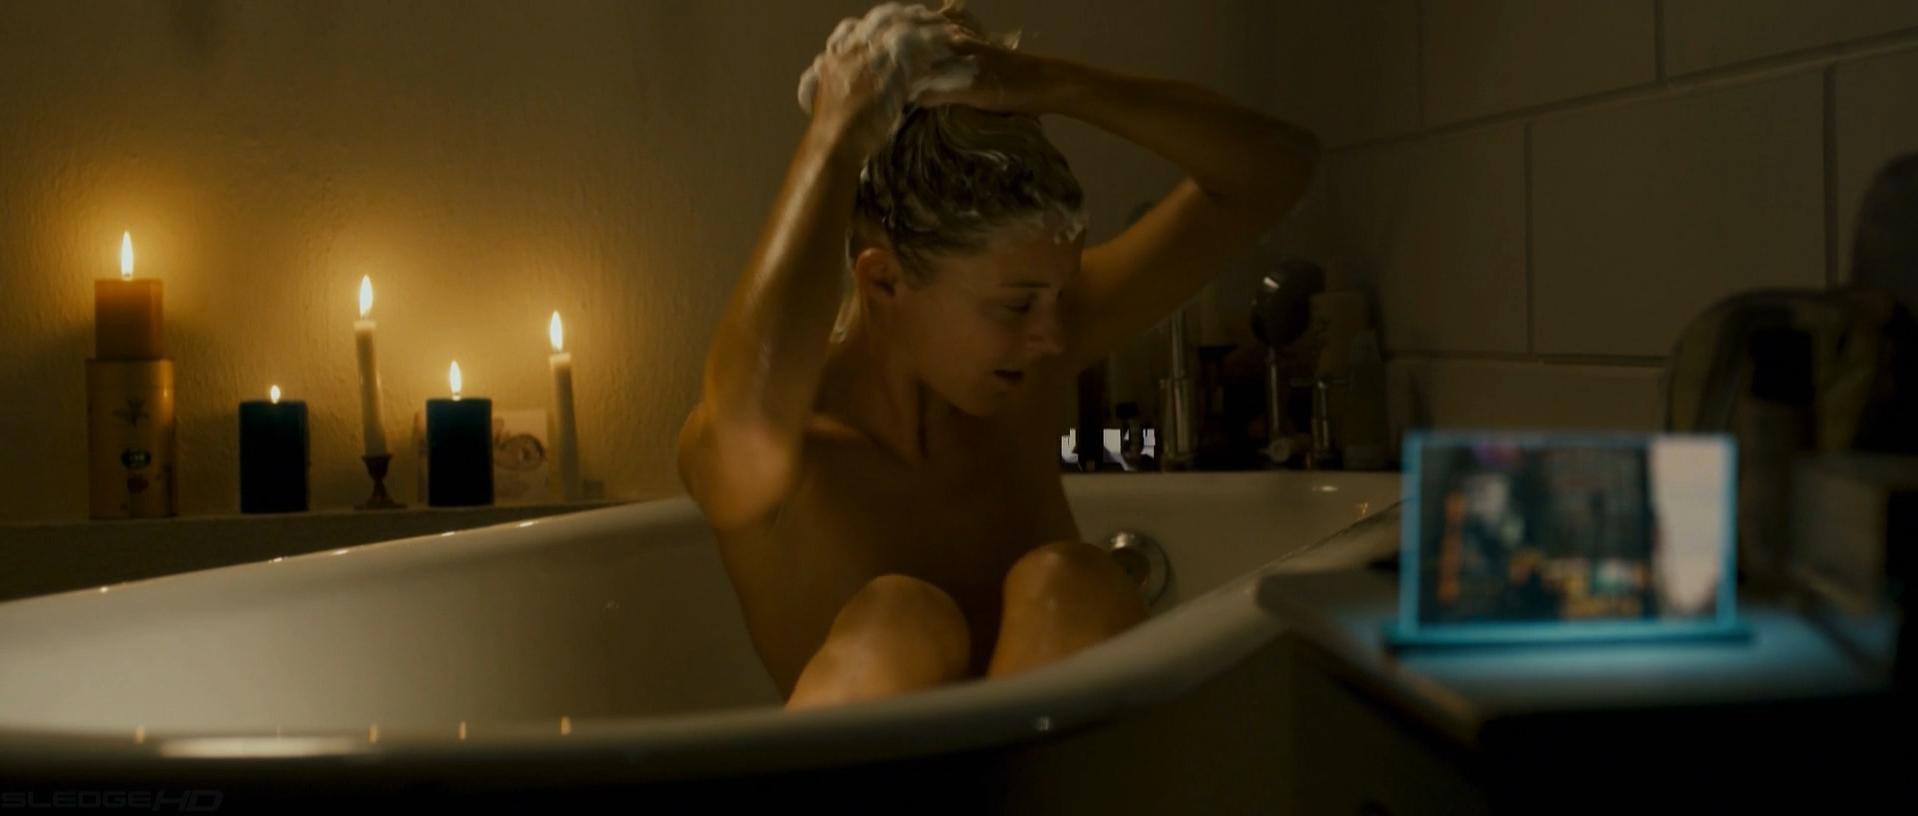 Bernadette Heerwagen nude - Die kommenden Tage (2010)